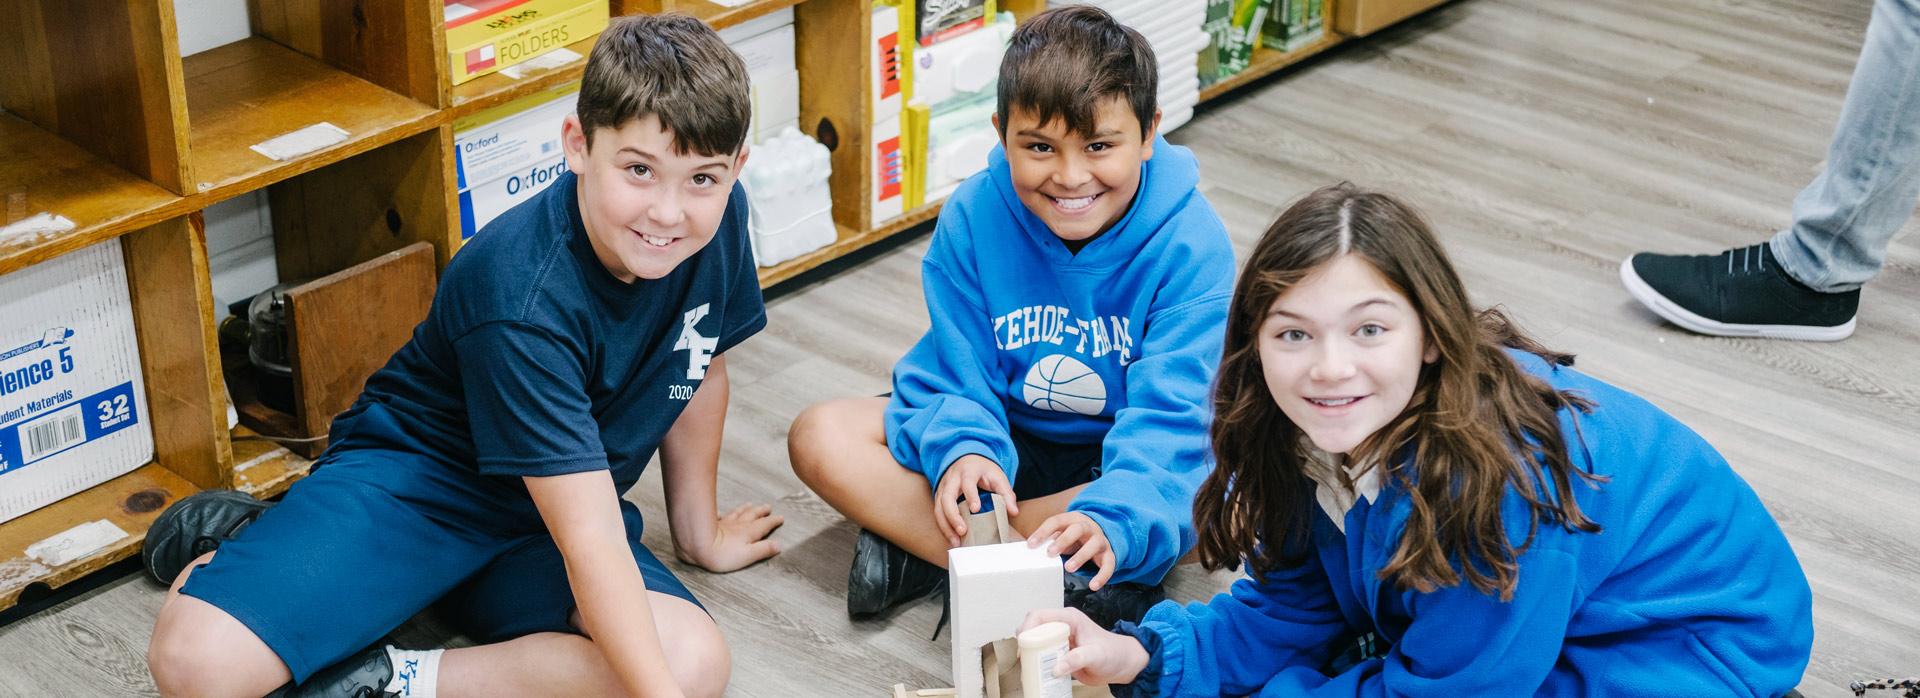 Why parents choose Kehoe-France Southshore School?